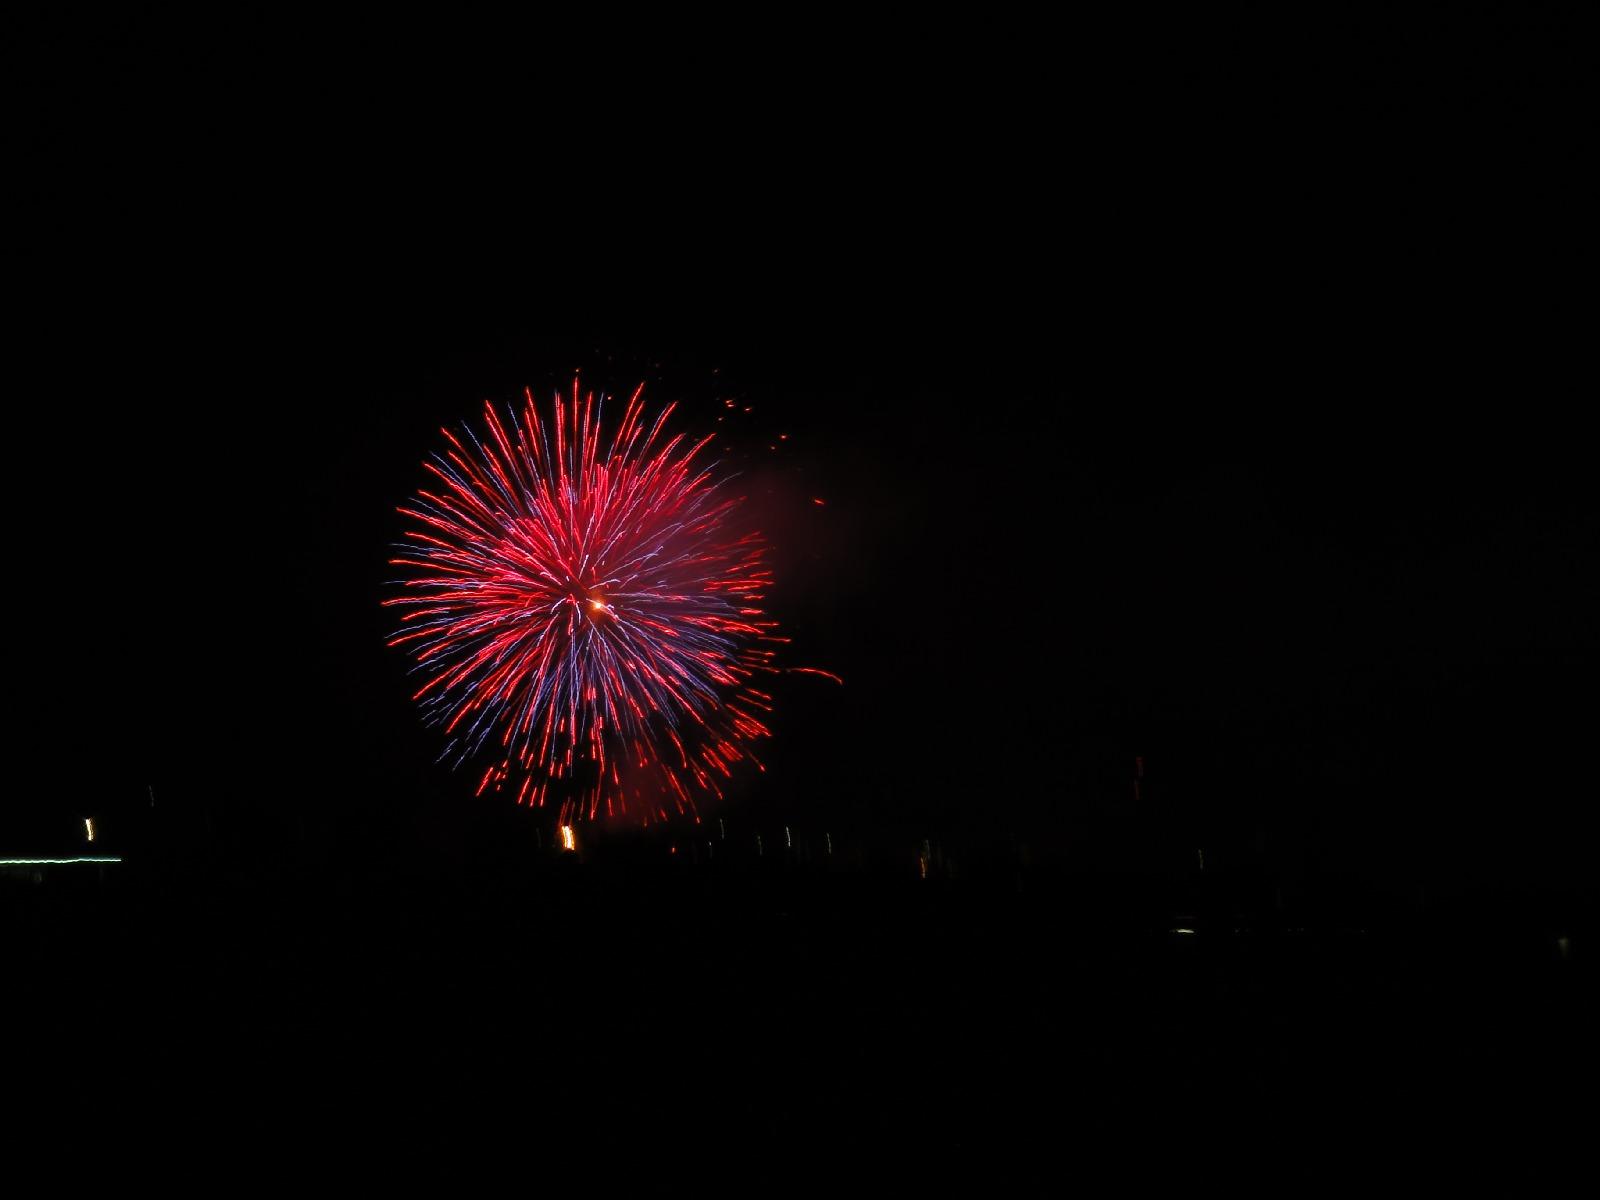 120728kasaokafireflower_016.jpg